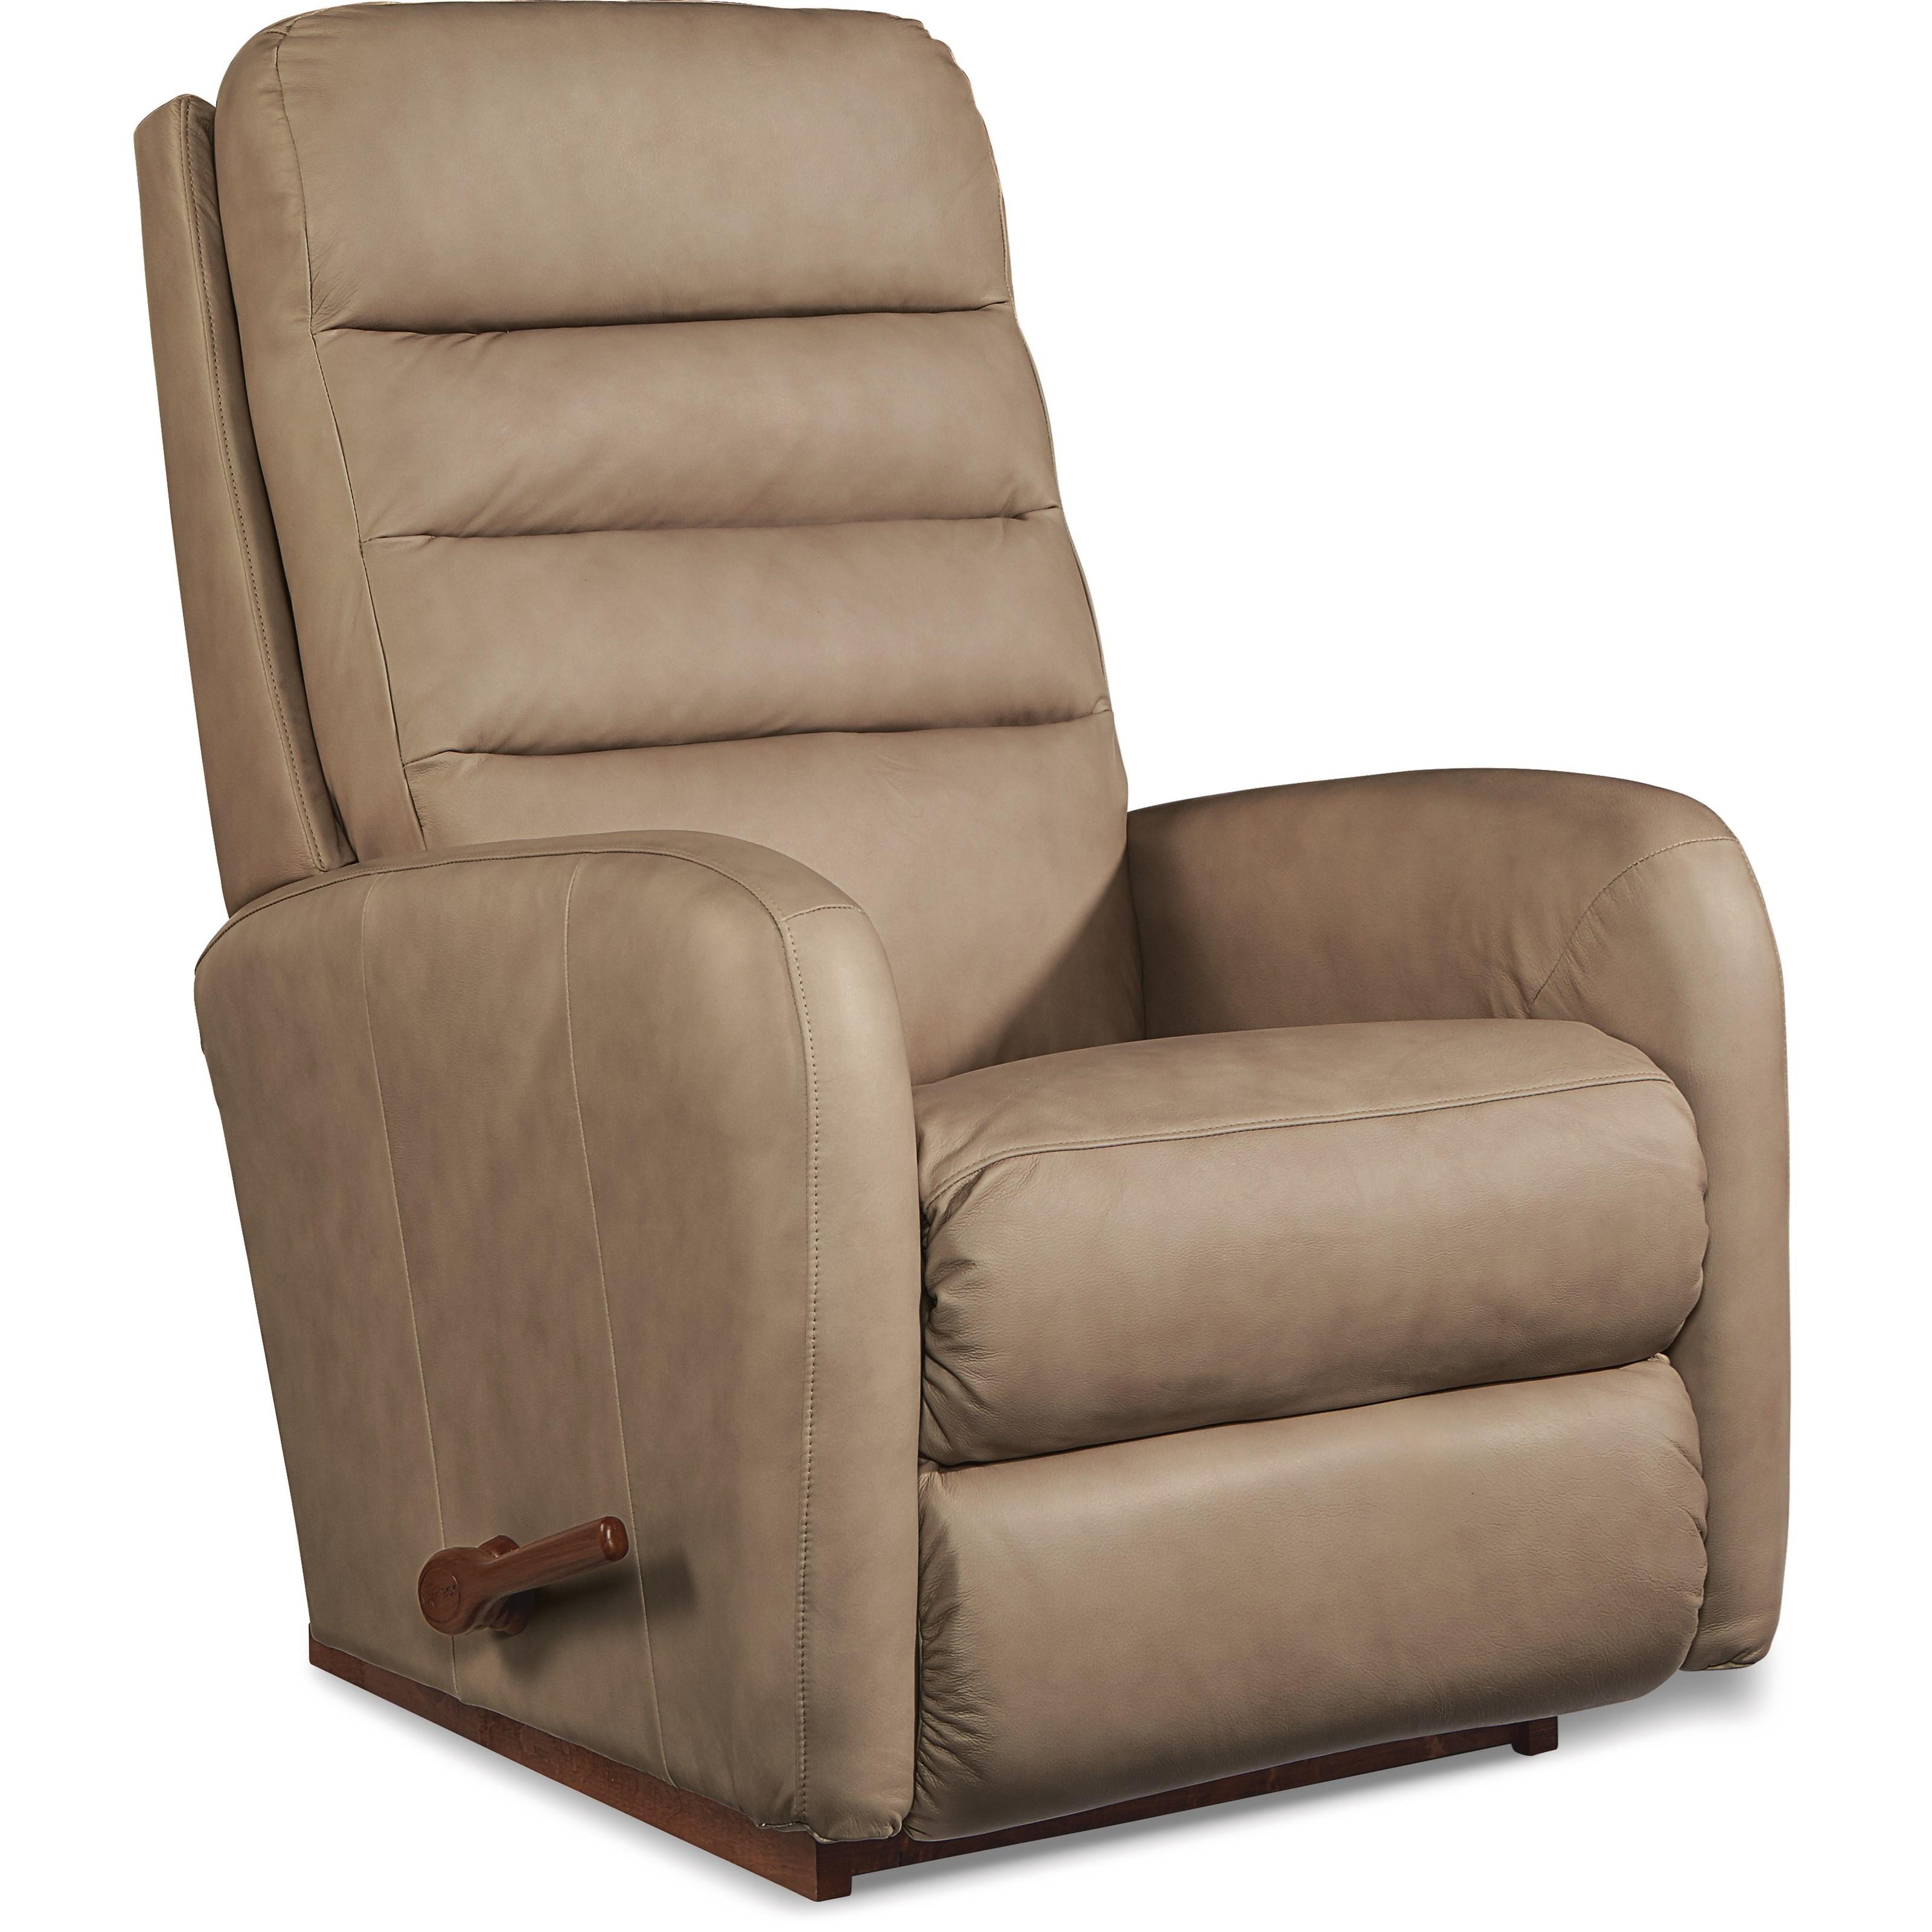 Forum Rocking Recliner by La-Z-Boy at HomeWorld Furniture